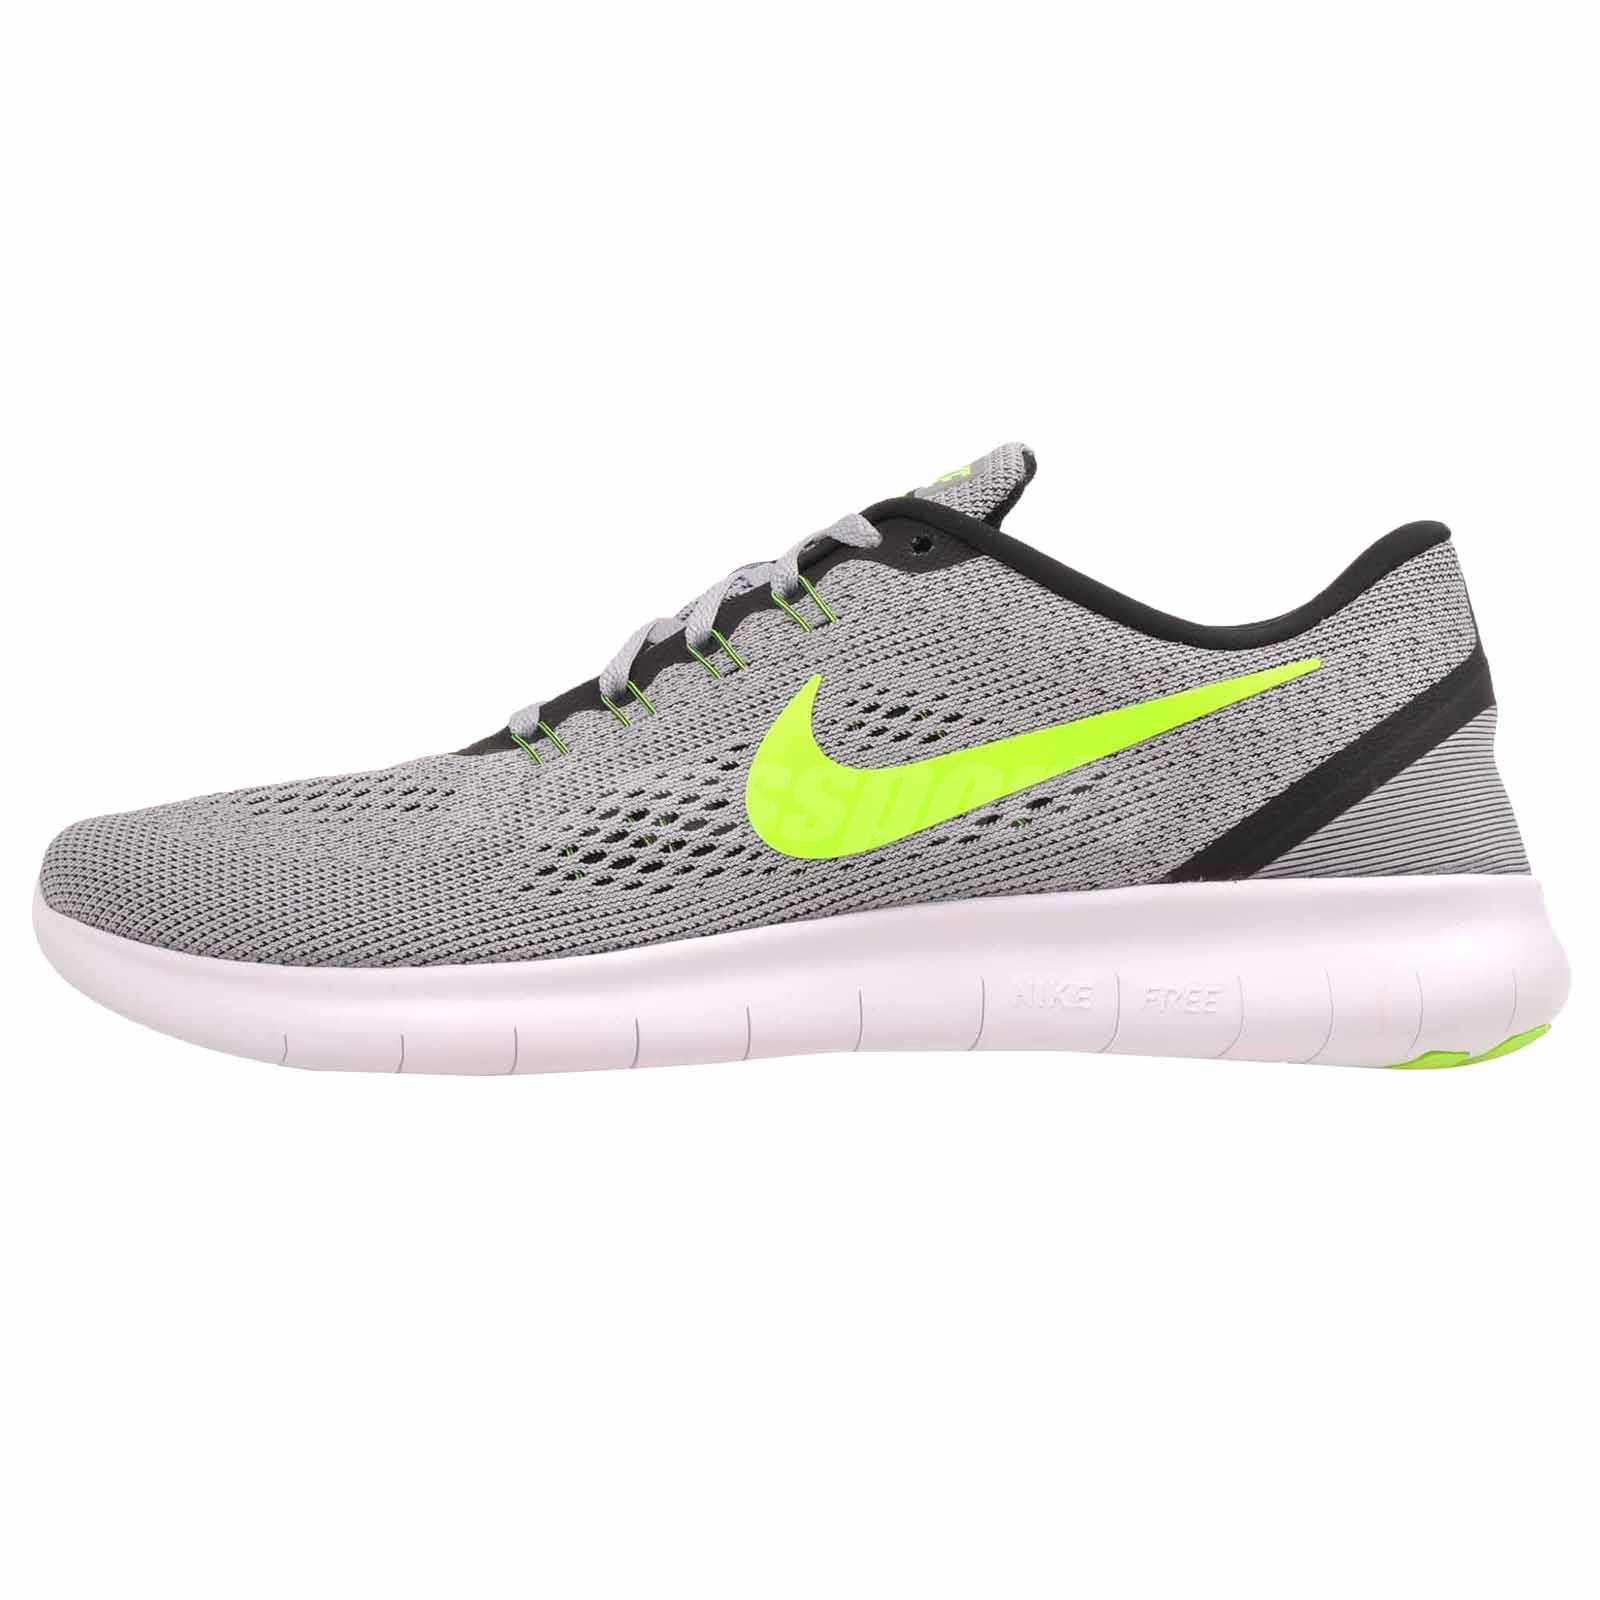 32b290467253a ... promo code for nike free rn running mens shoes grey green 831508 003  89225 70b66